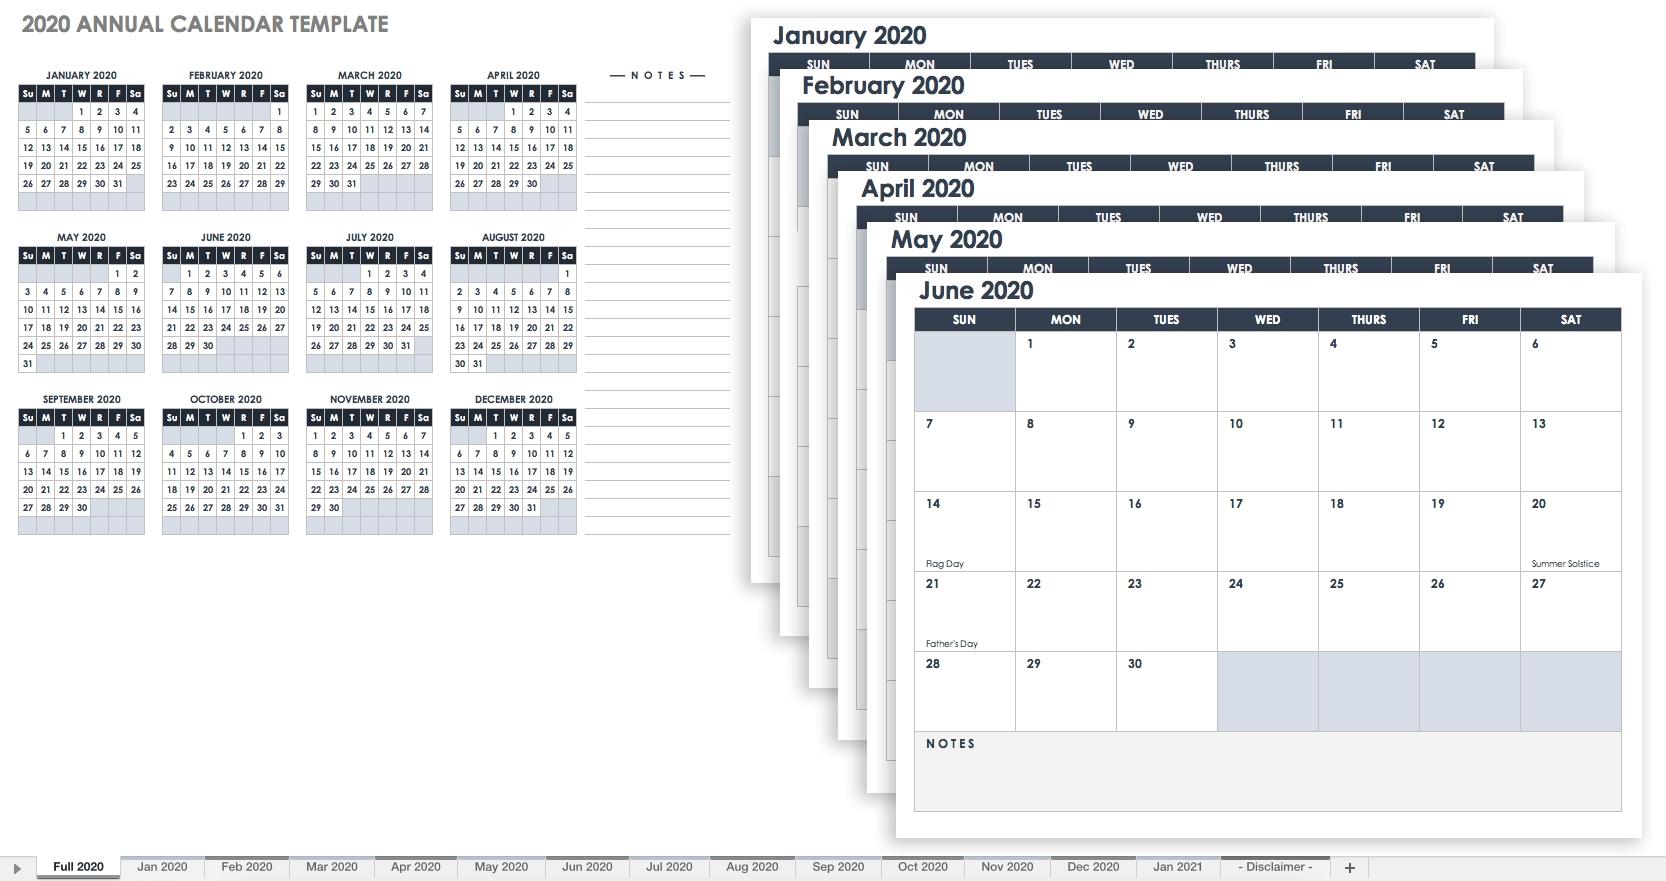 Free, Printable Excel Calendar Templates For 2019 & On | Smartsheet inside Calendar 2019 2020 Xls